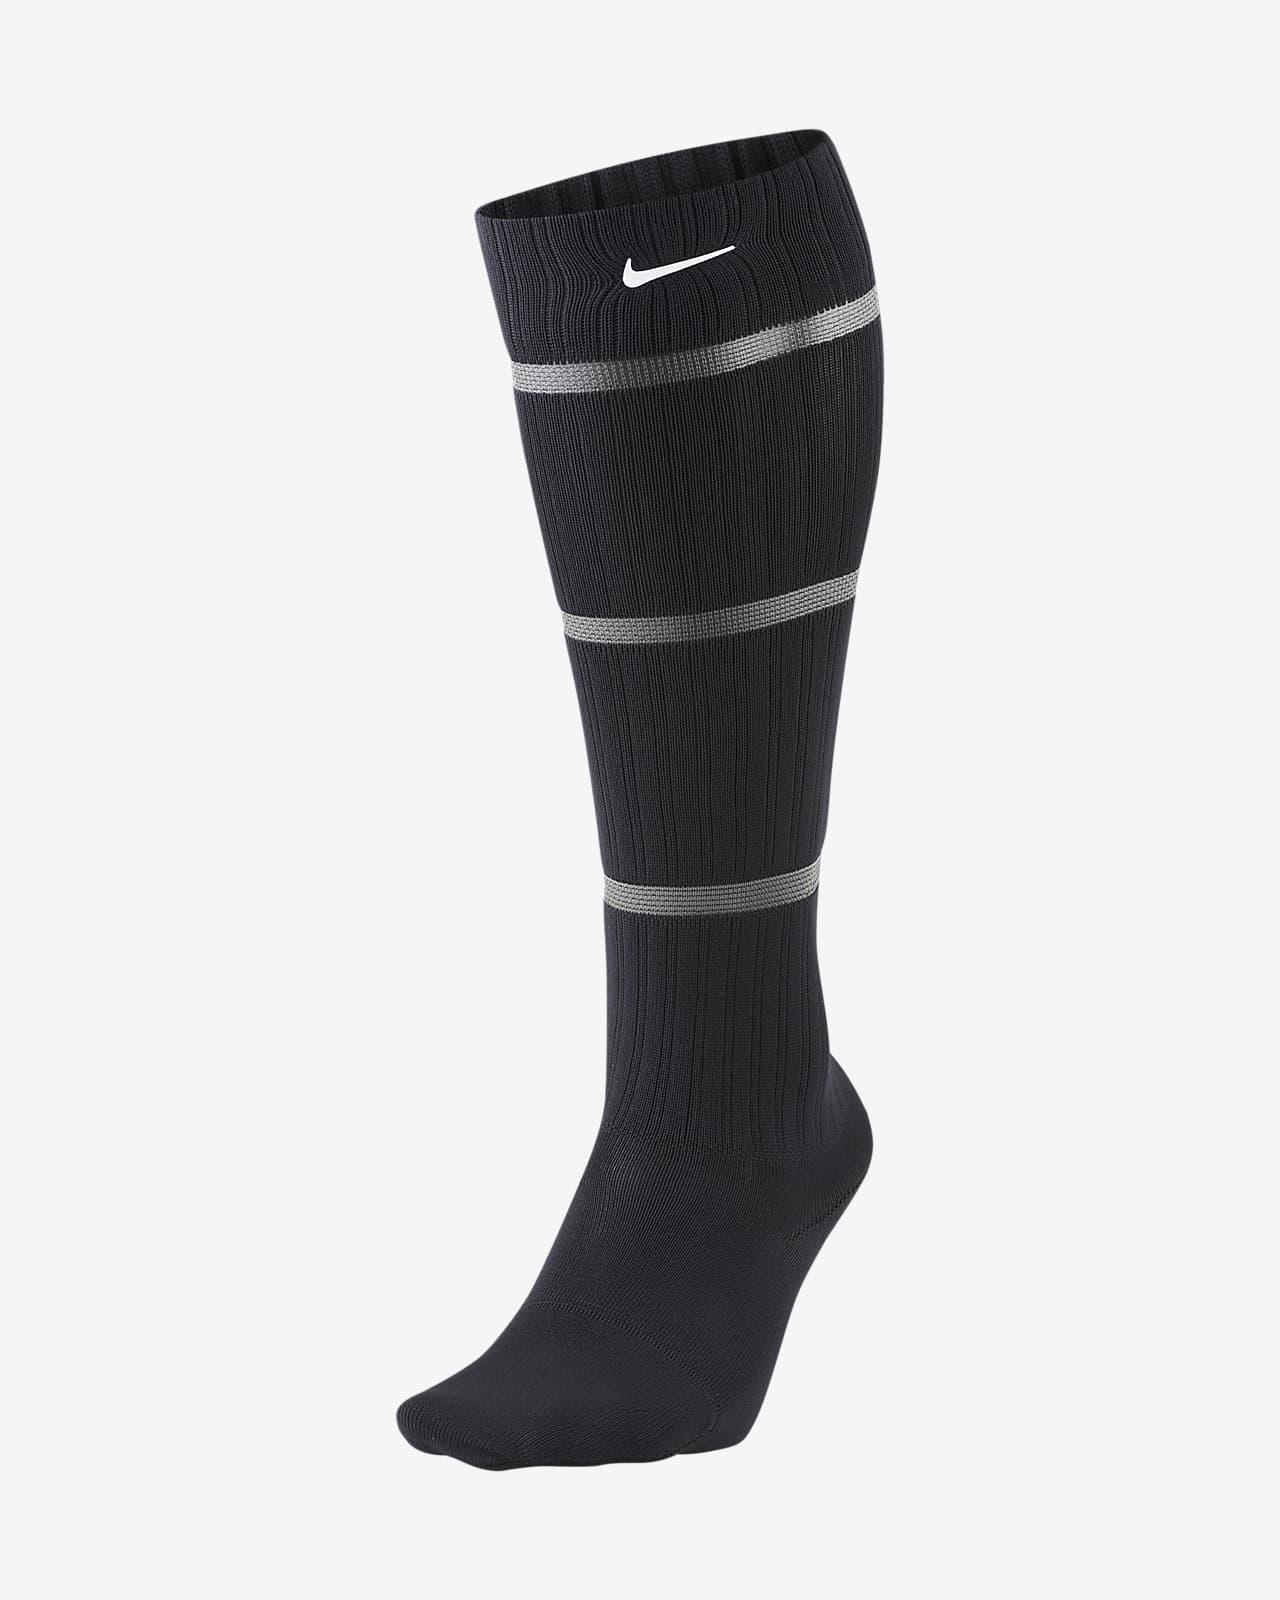 Nike One Women's Training Over-the-Calf Socks